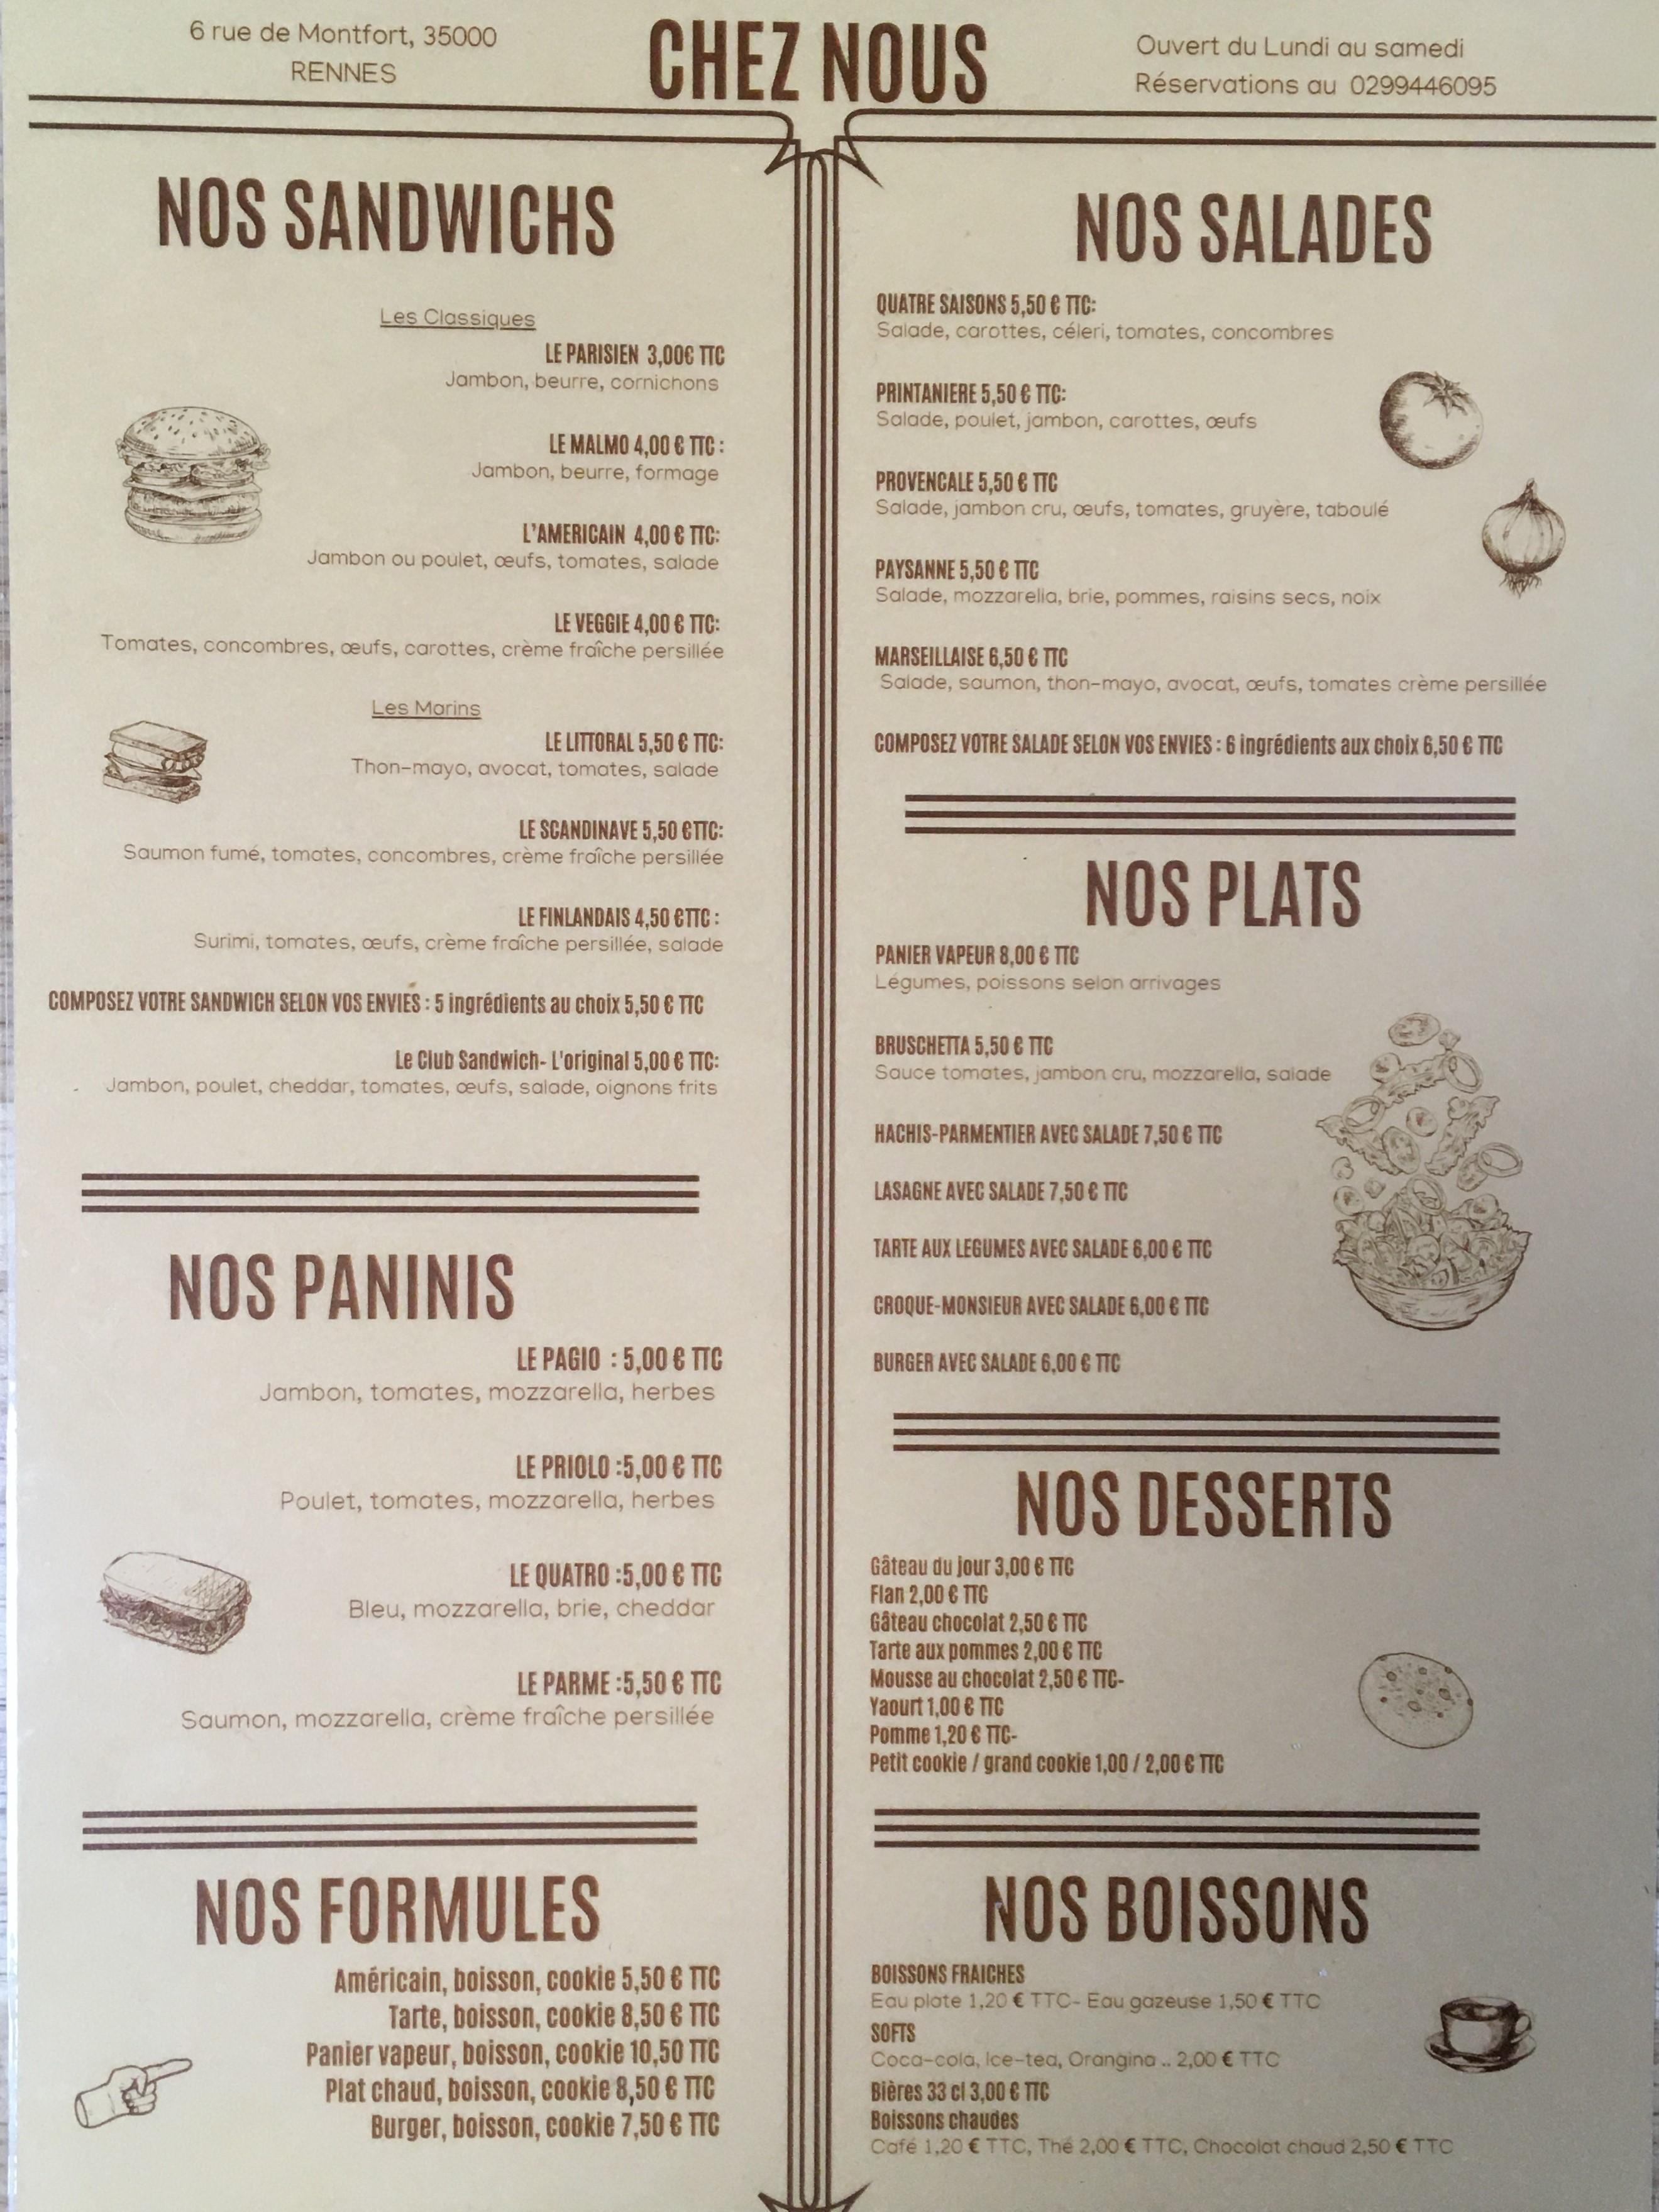 Chez Nous Rennes French Cuisine Near Me Book Now